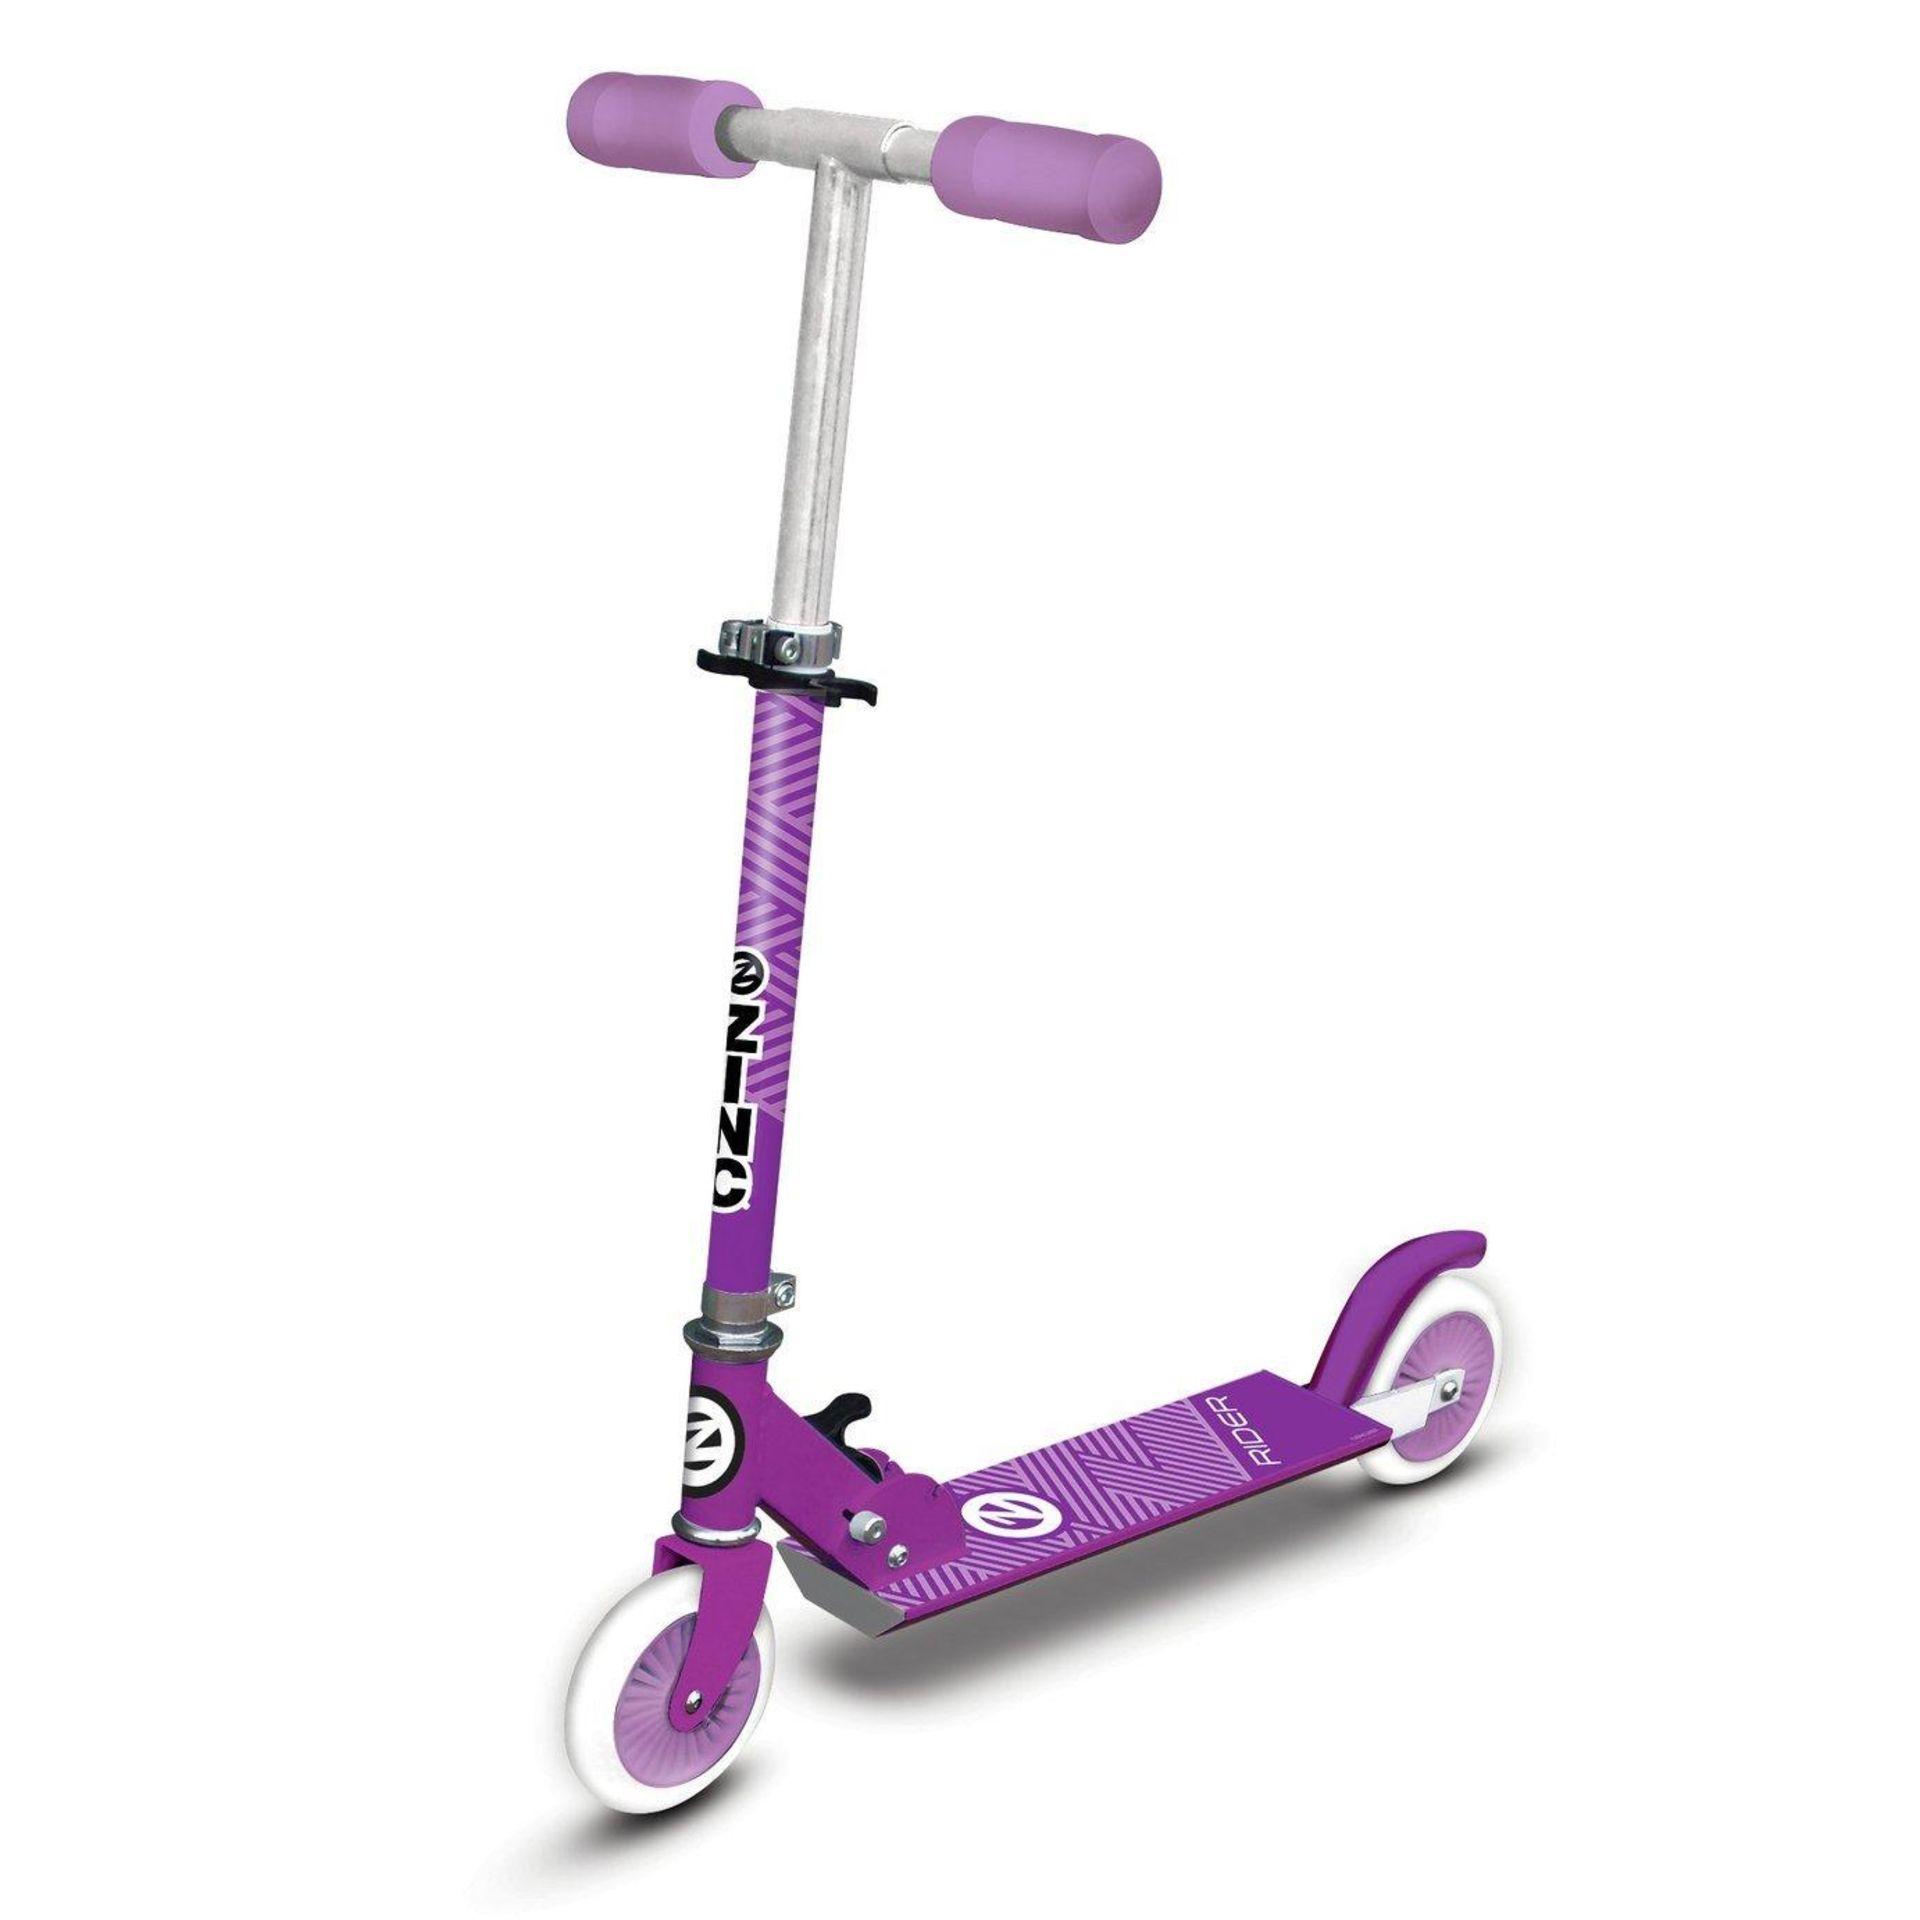 Zinc Folding Inline Scooter - Pink, £15.99 RRP